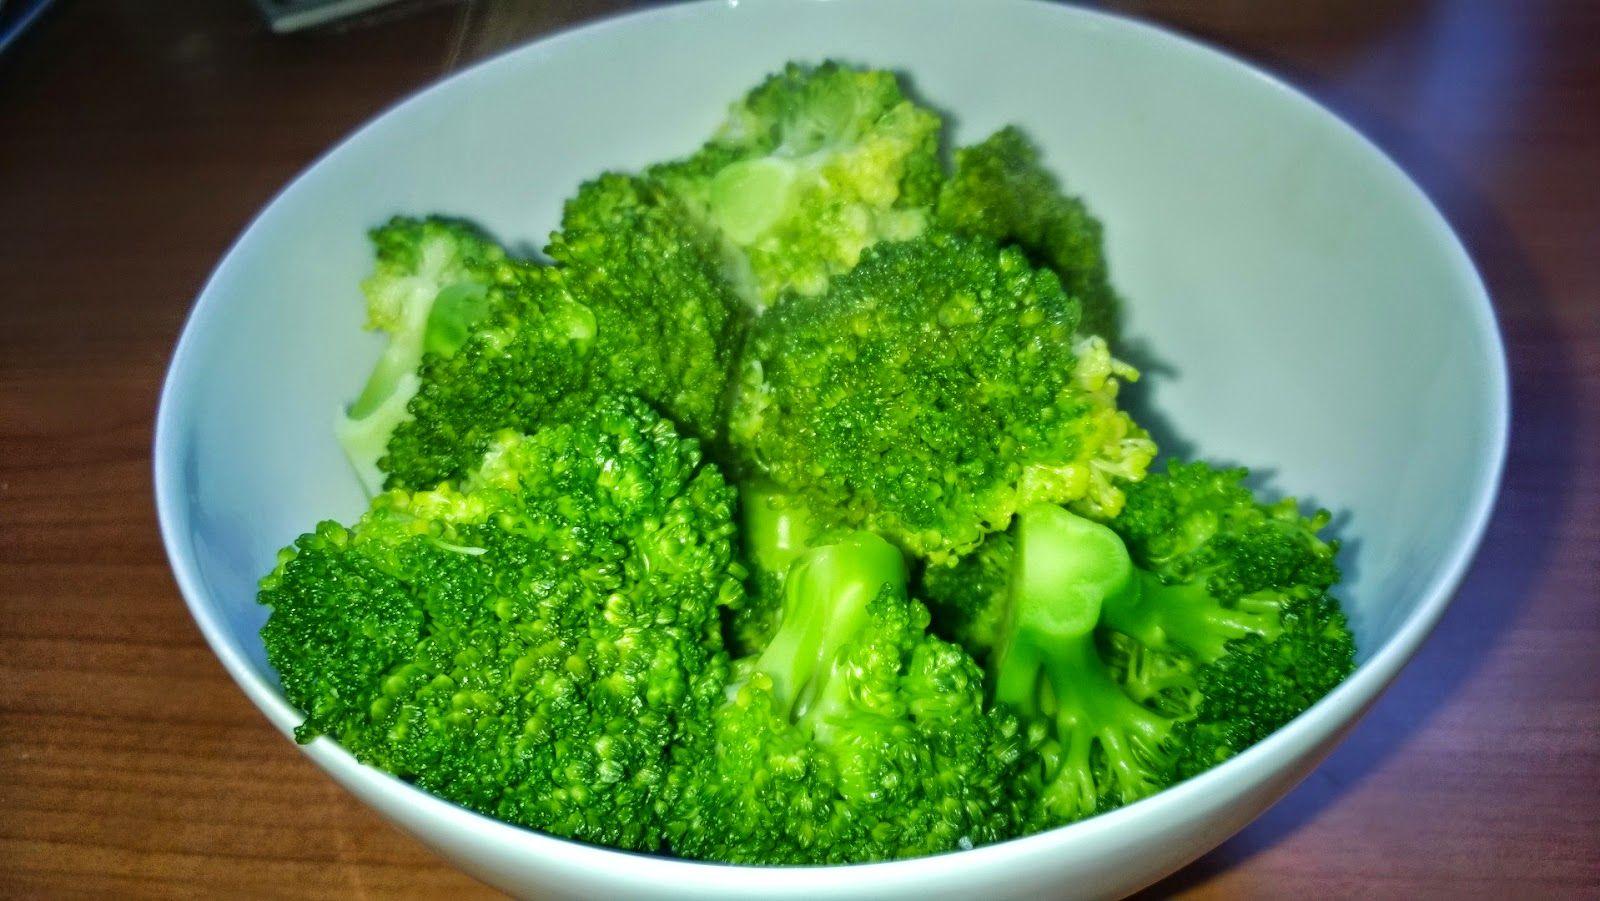 Tupun tupa: Keitetty parsakaali